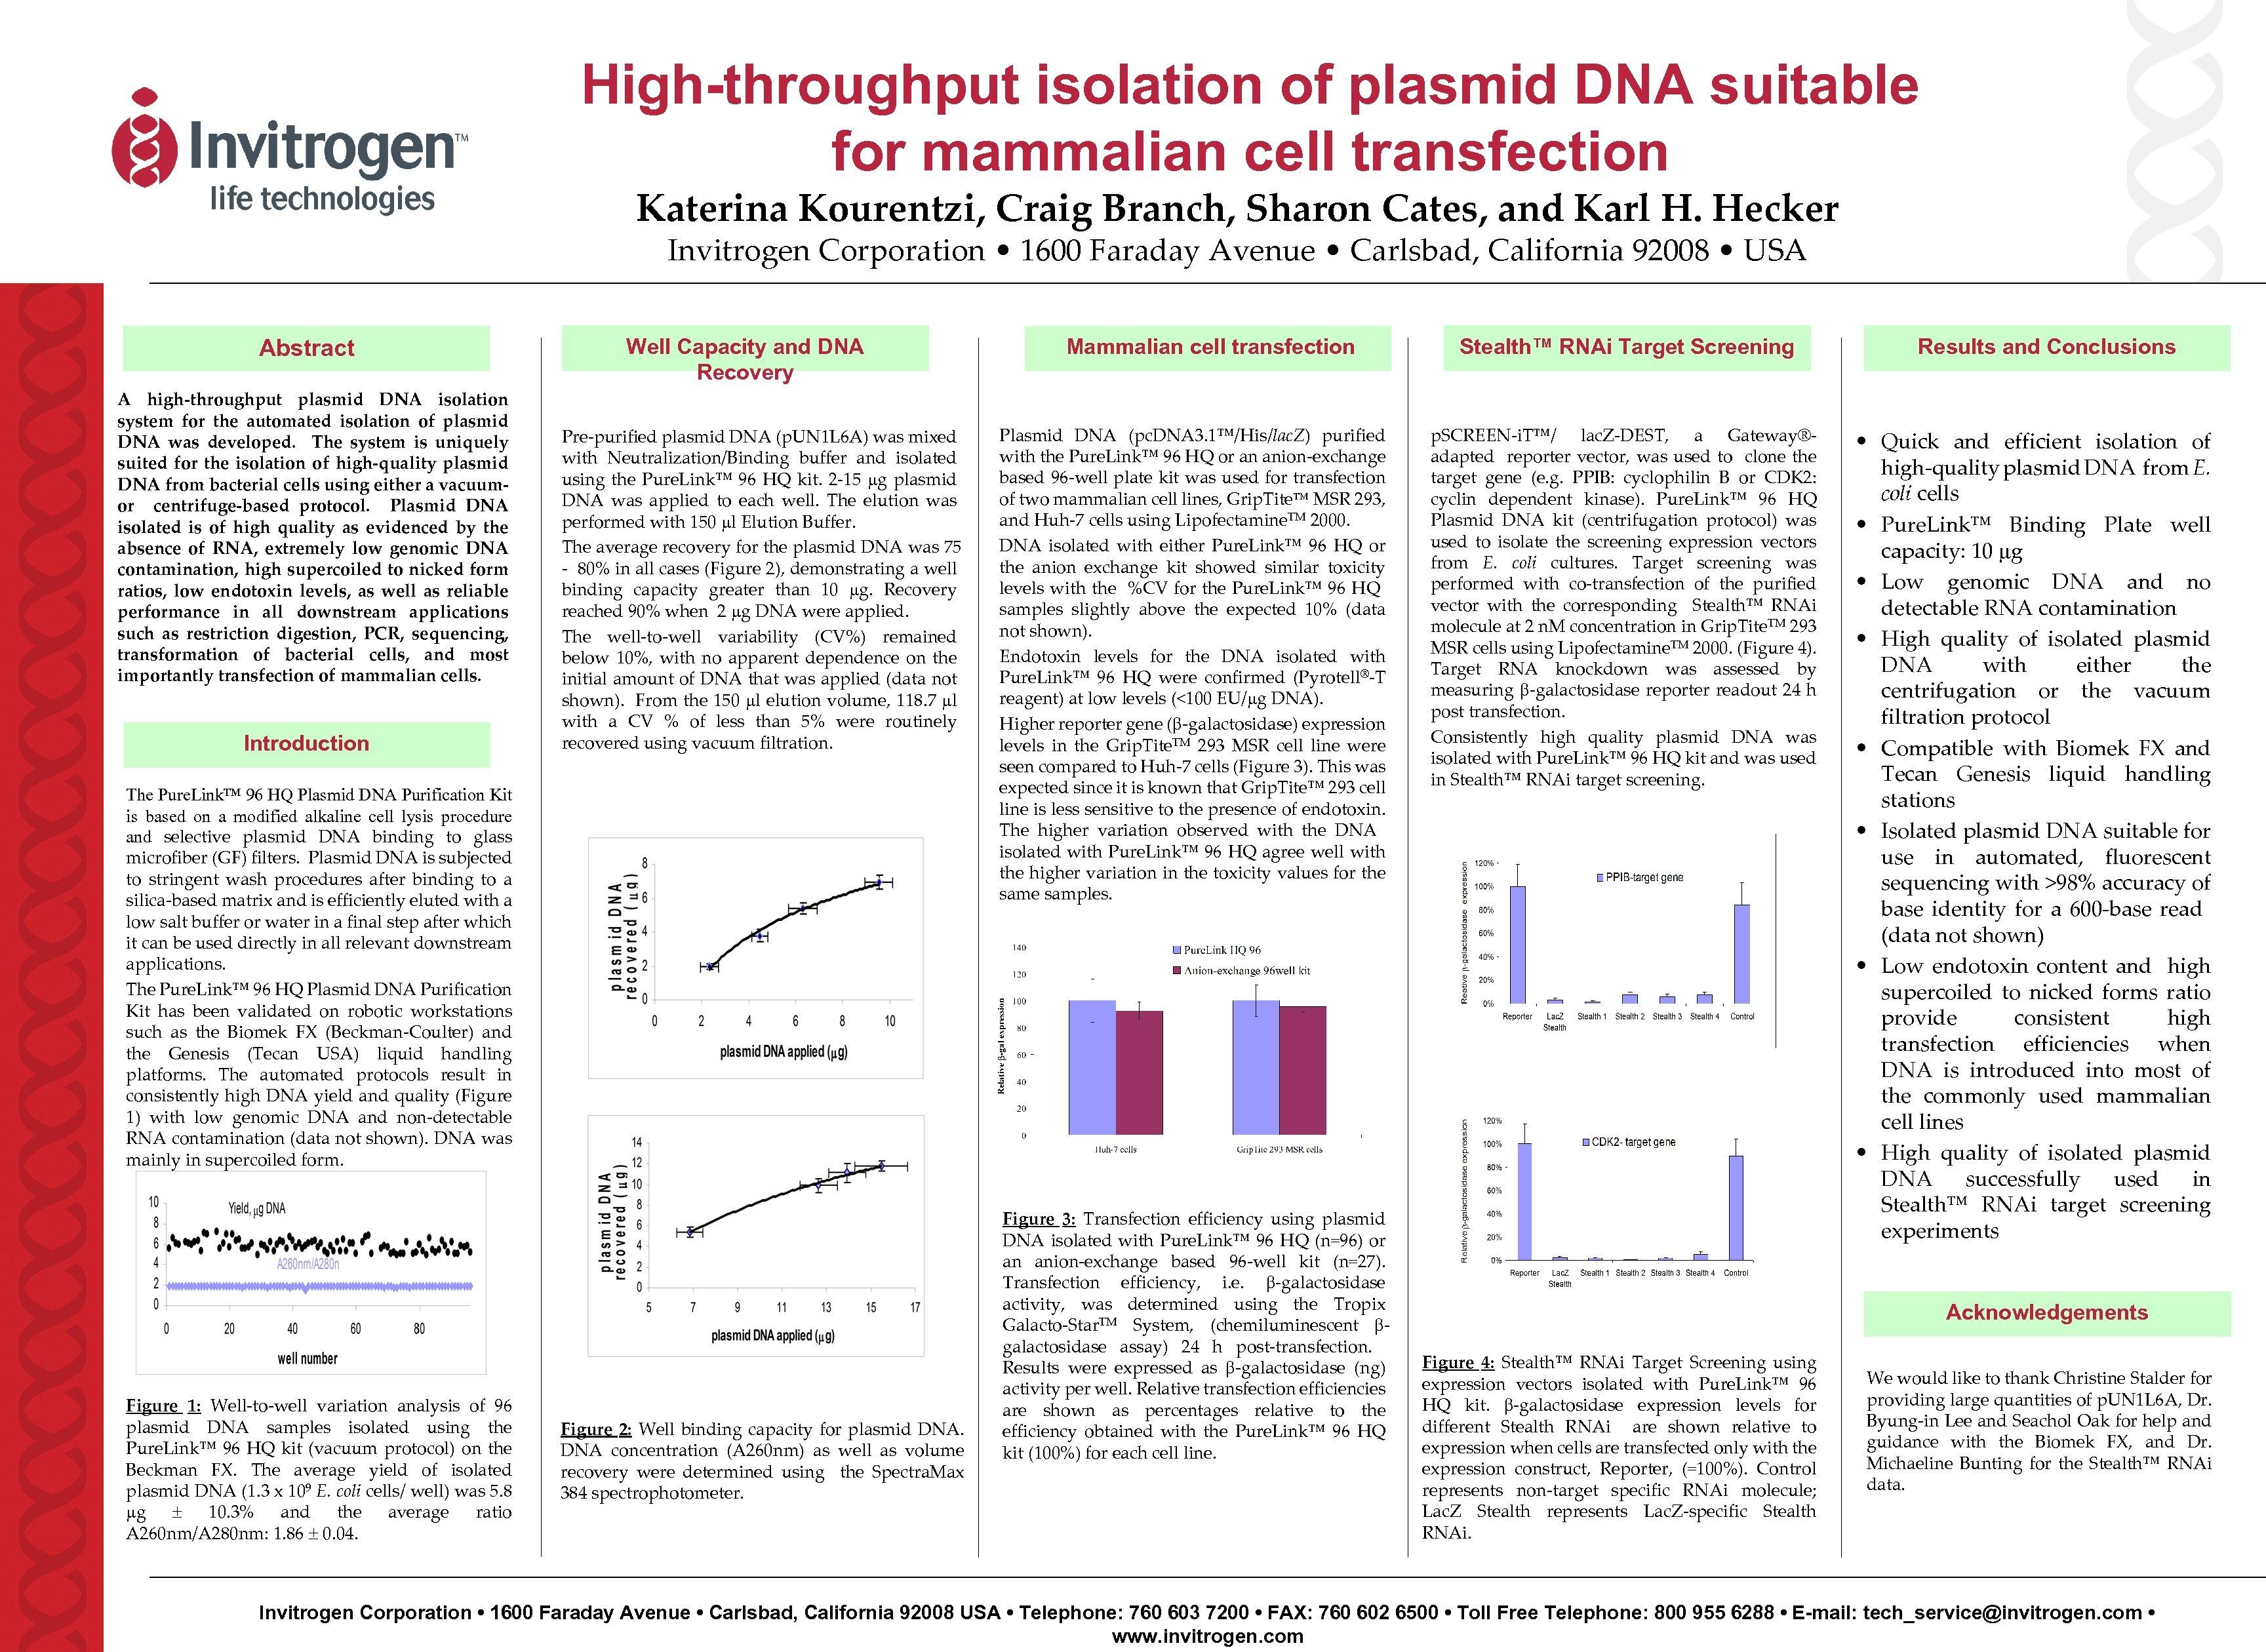 High-throughput isolation of plasmid DNA suitable for mammalian cell transfection Katerina Kourentzi, Craig Branch,